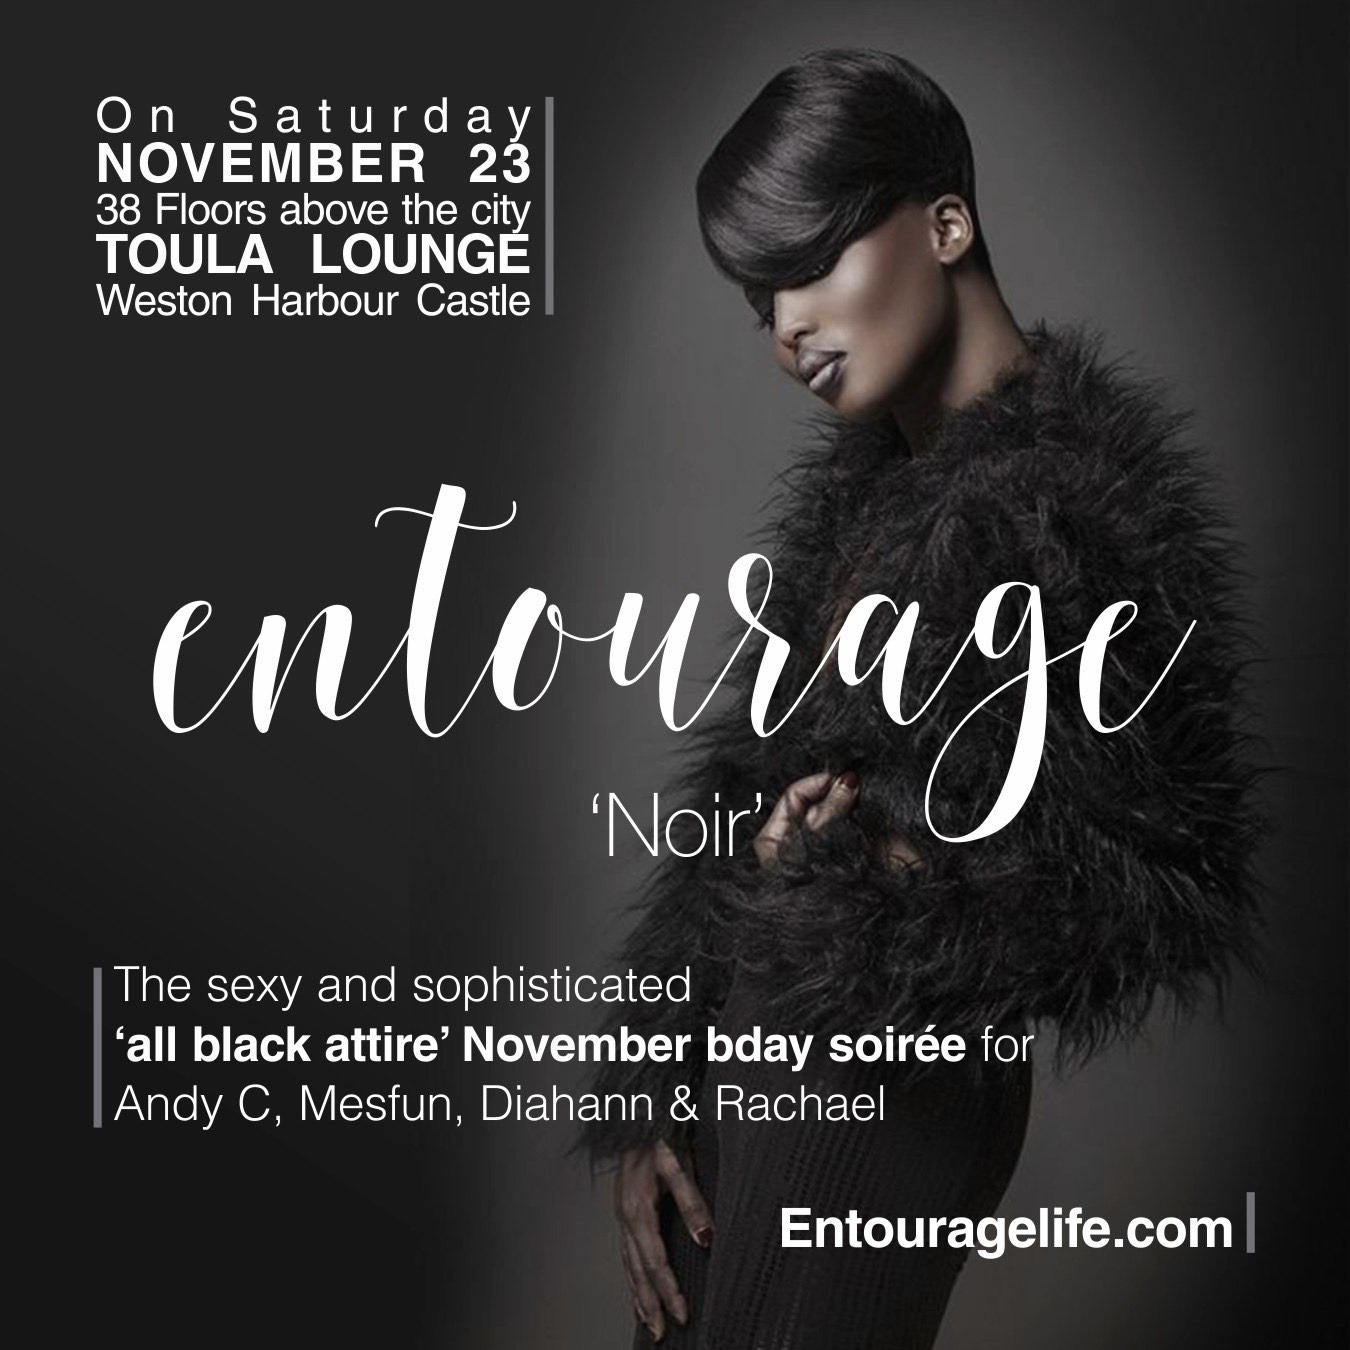 ENTOURAGE 'Noir' - all black attire November birthday celebration